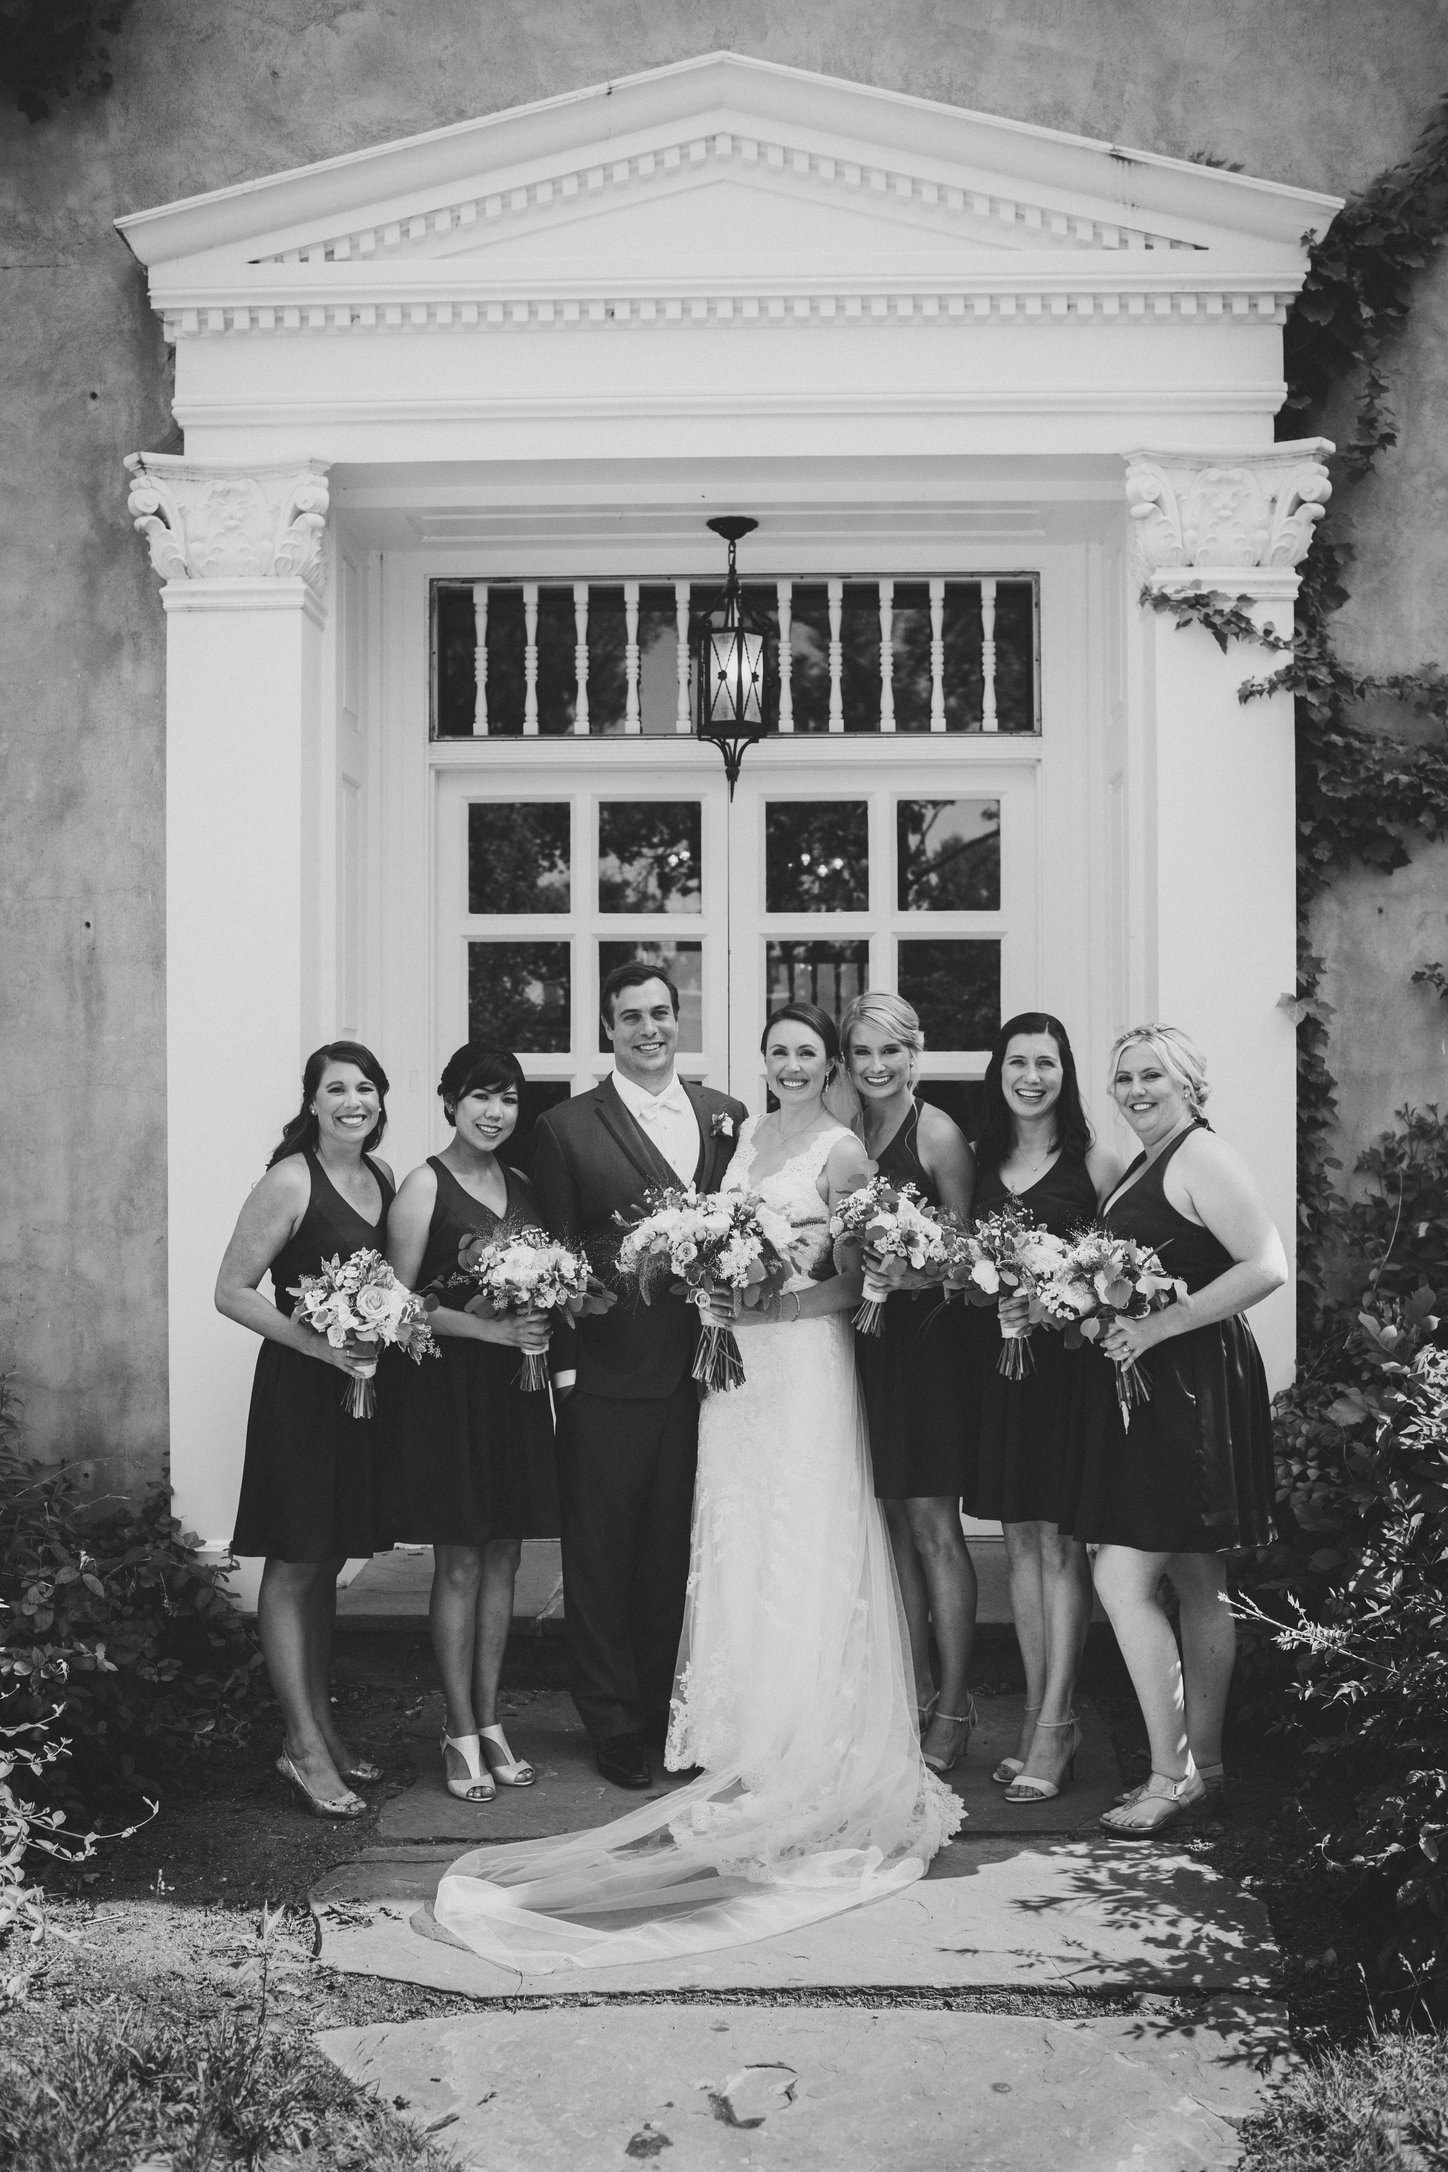 SandC-wedding-347.jpg